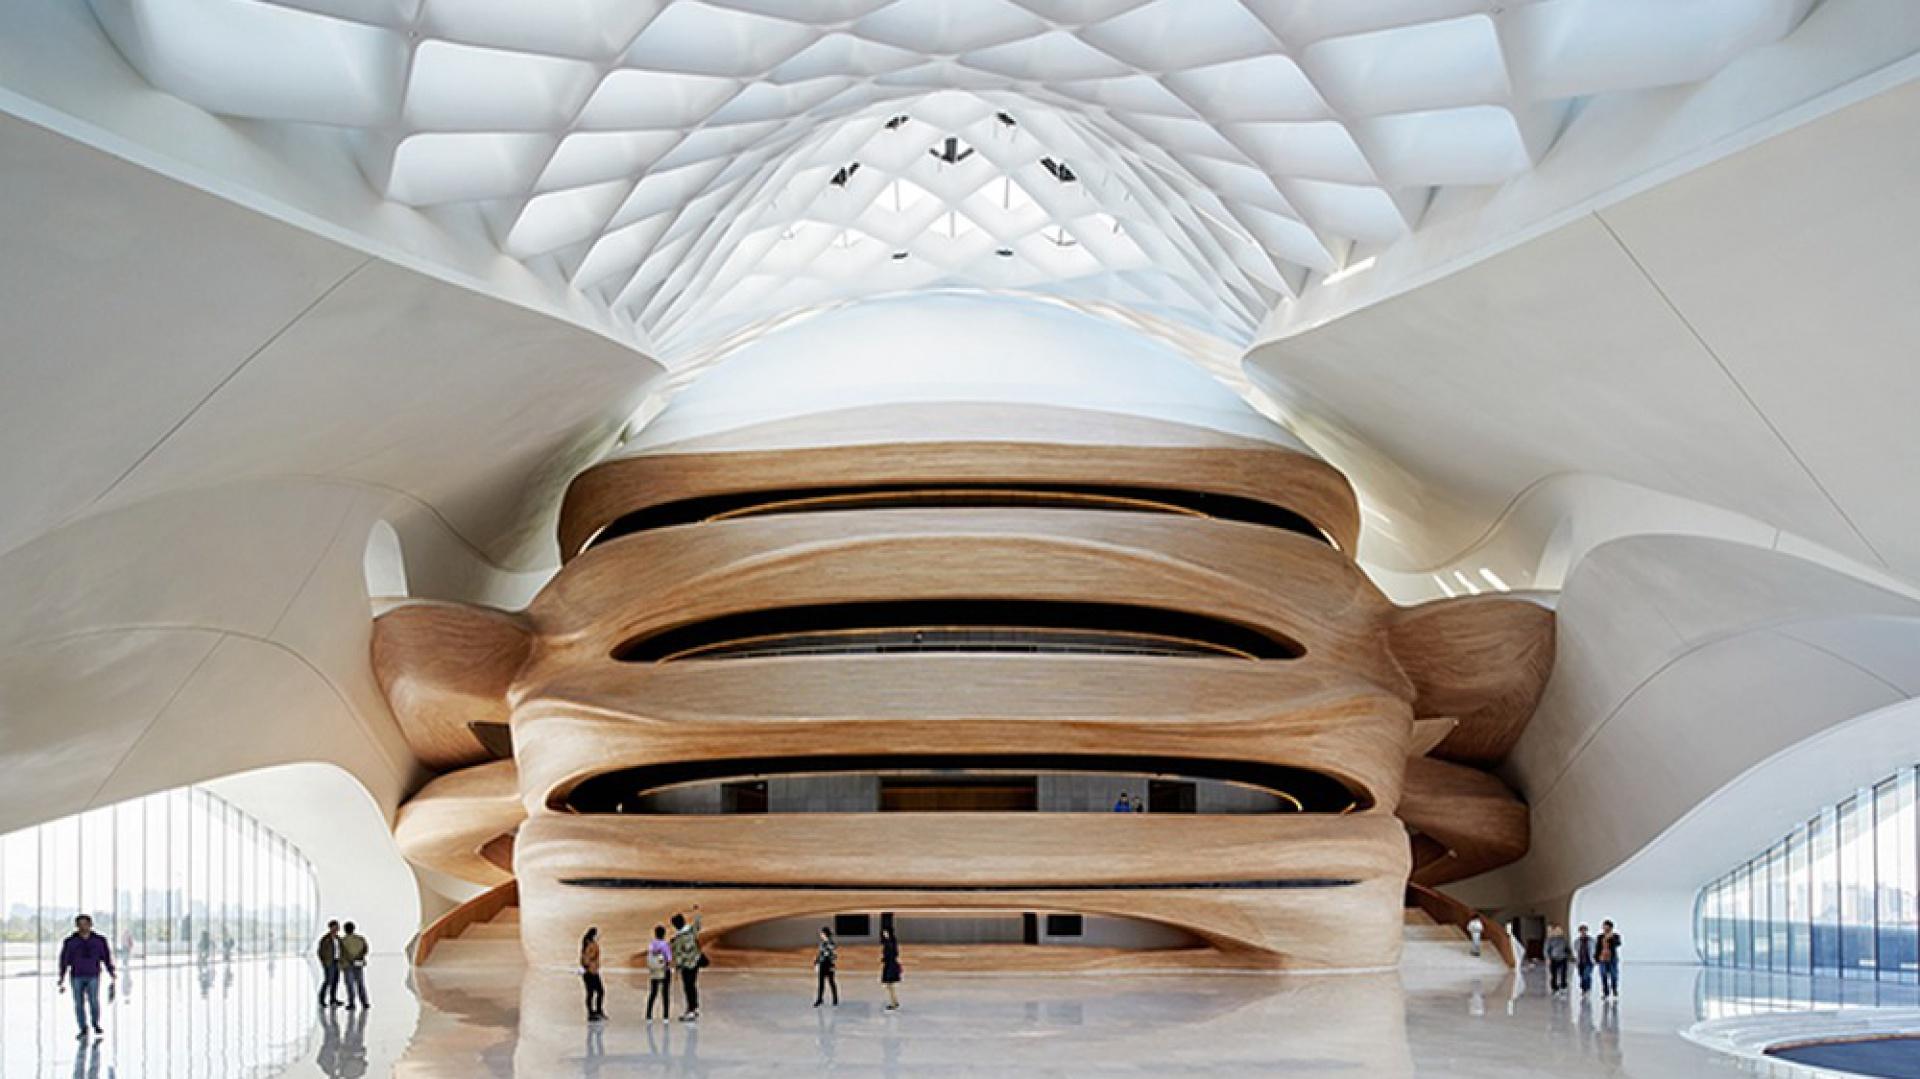 Harbin Opera House w Chinach. Fot. MAD/Hufton+Crow/Adam Mørk